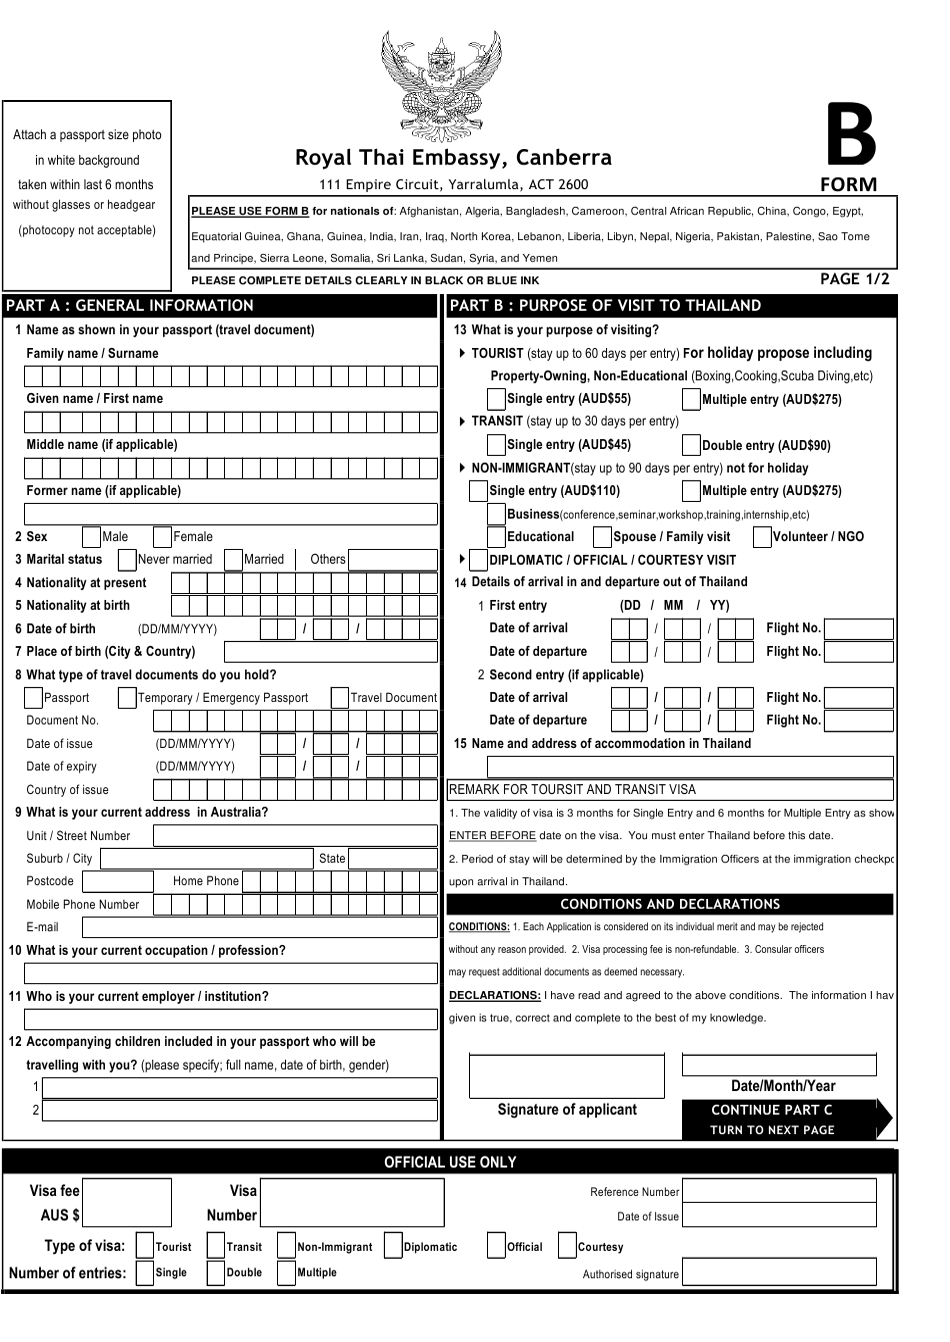 Form B Download Printable Pdf Or Fill Online Thai Visa Application Form Royal Thai Embassy Canberra Australia Templateroller